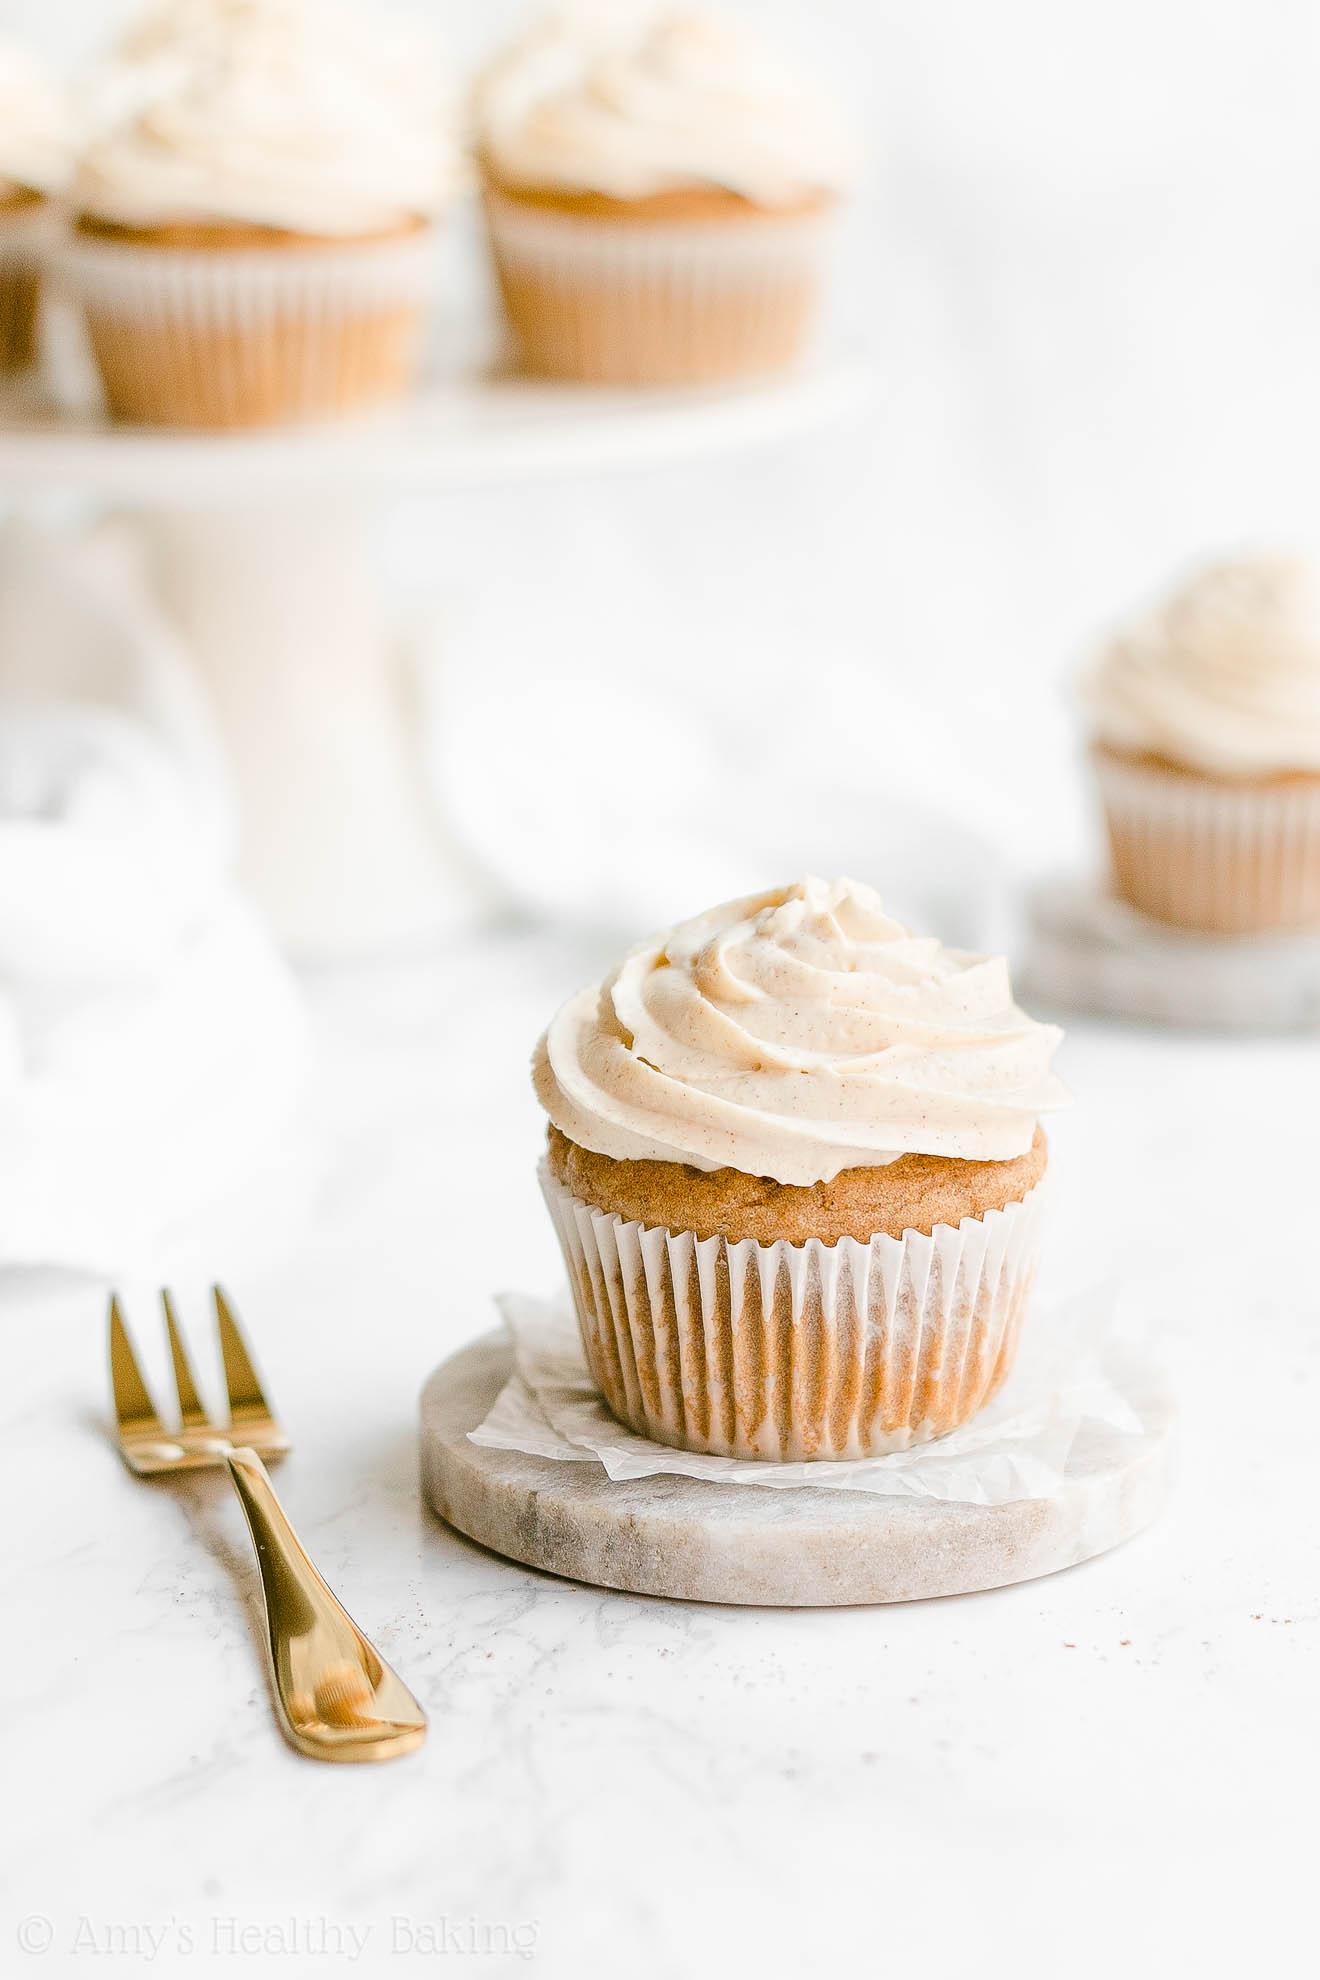 Easy Healthy Low Fat Low Calorie Moist Christmas Eggnog Cupcakes